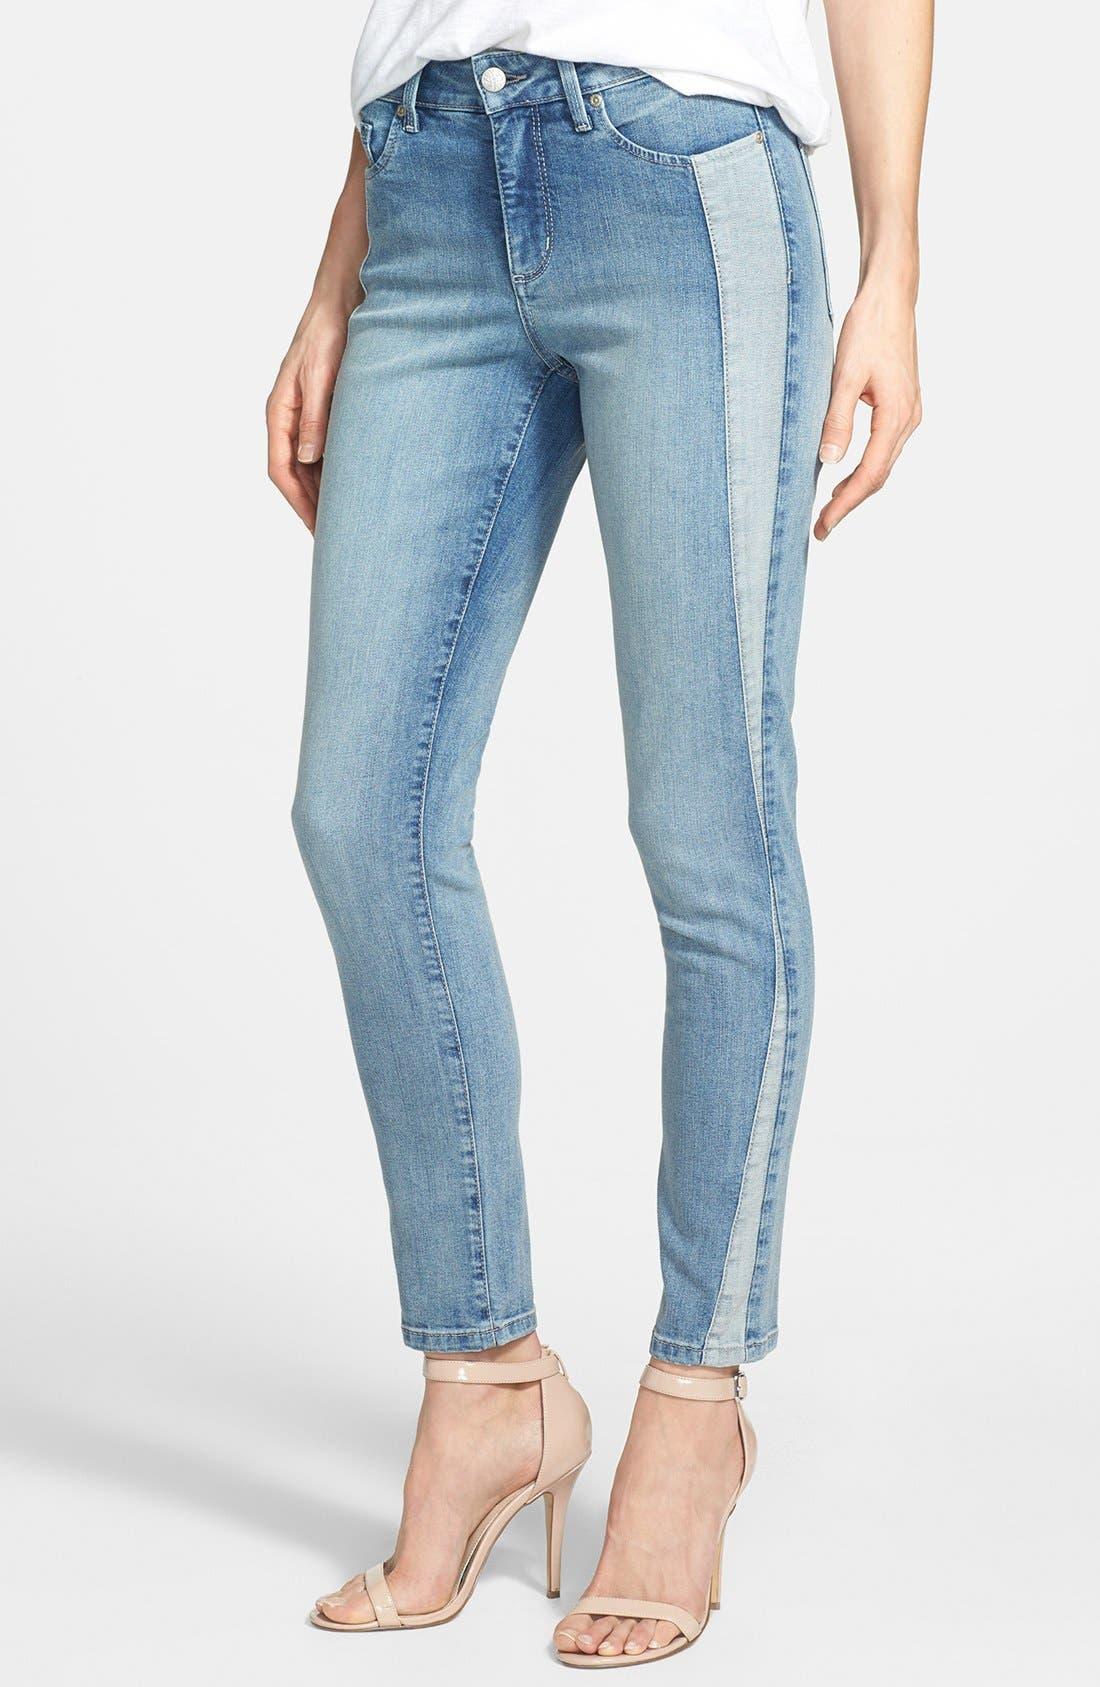 Alternate Image 1 Selected - NYDJ 'Annalynn' Side Inset Stretch Skinny Jeans (Stockton) (Regular & Petite)